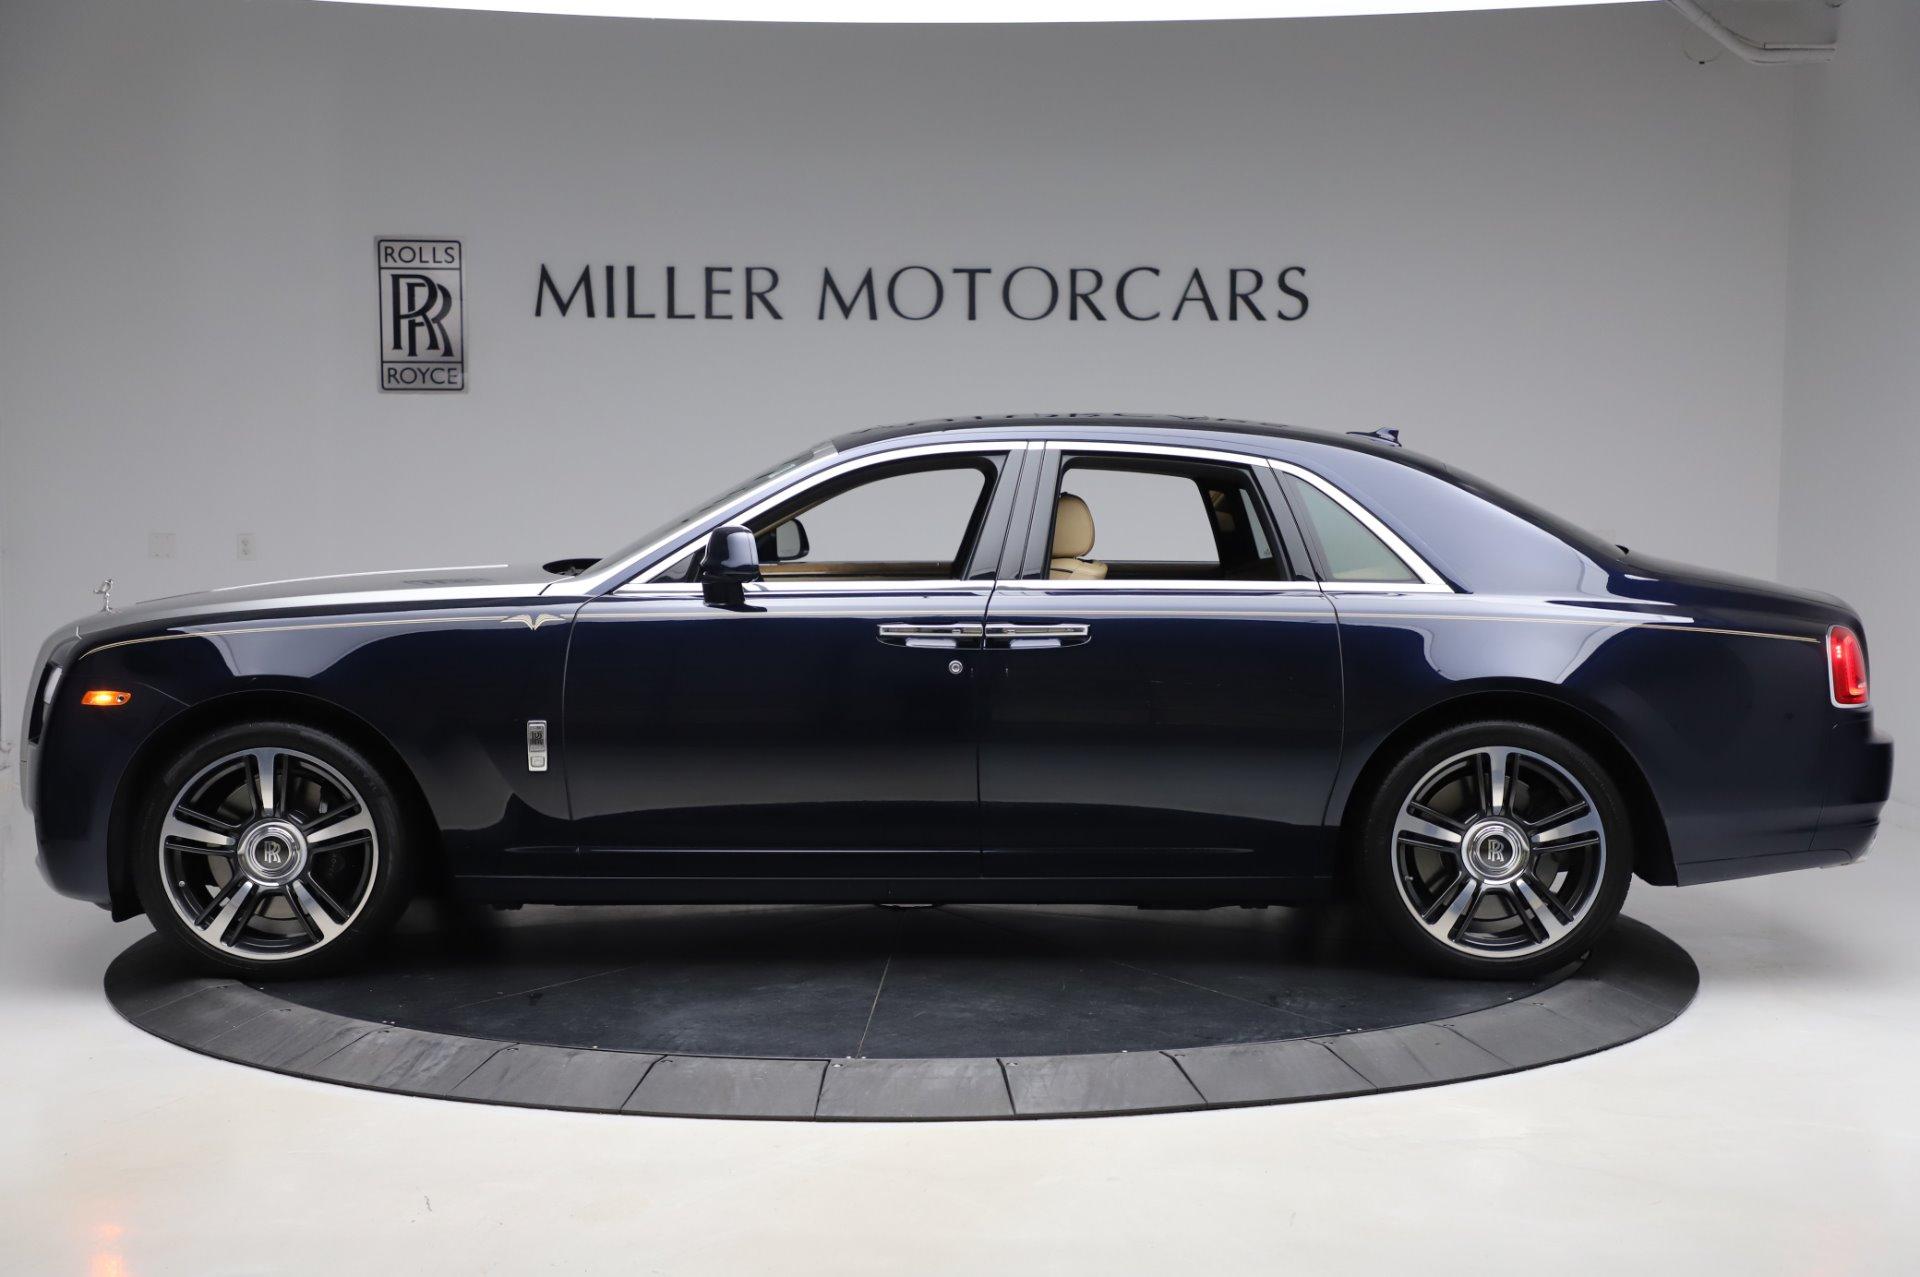 Used 2014 Rolls-Royce Ghost V-Spec For Sale In Westport, CT 858_p3